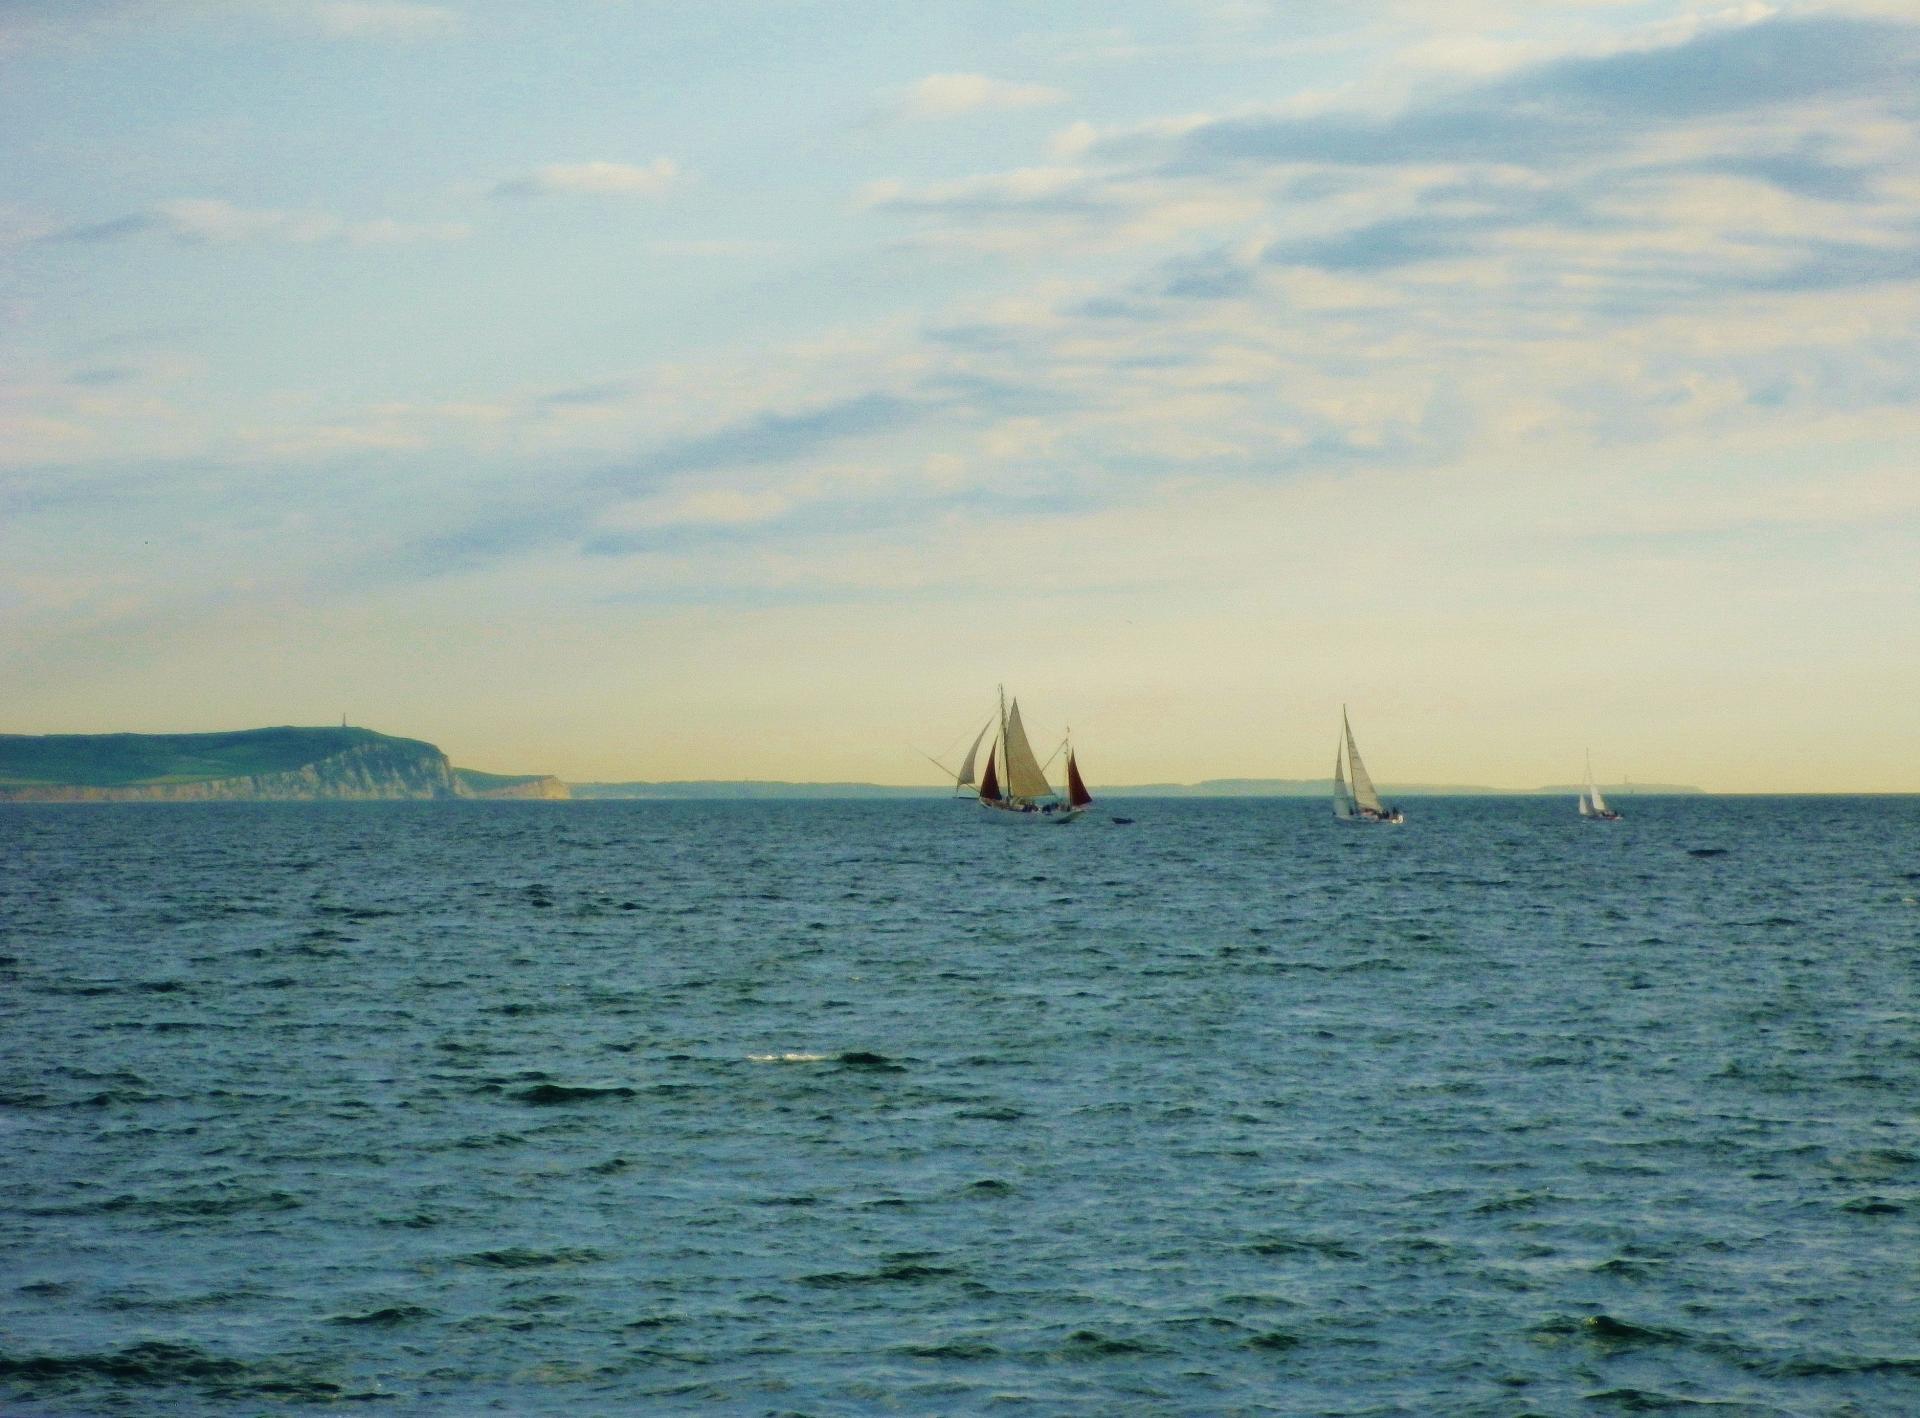 Fete maritime calais promenade en mer proche du cap blanc nez